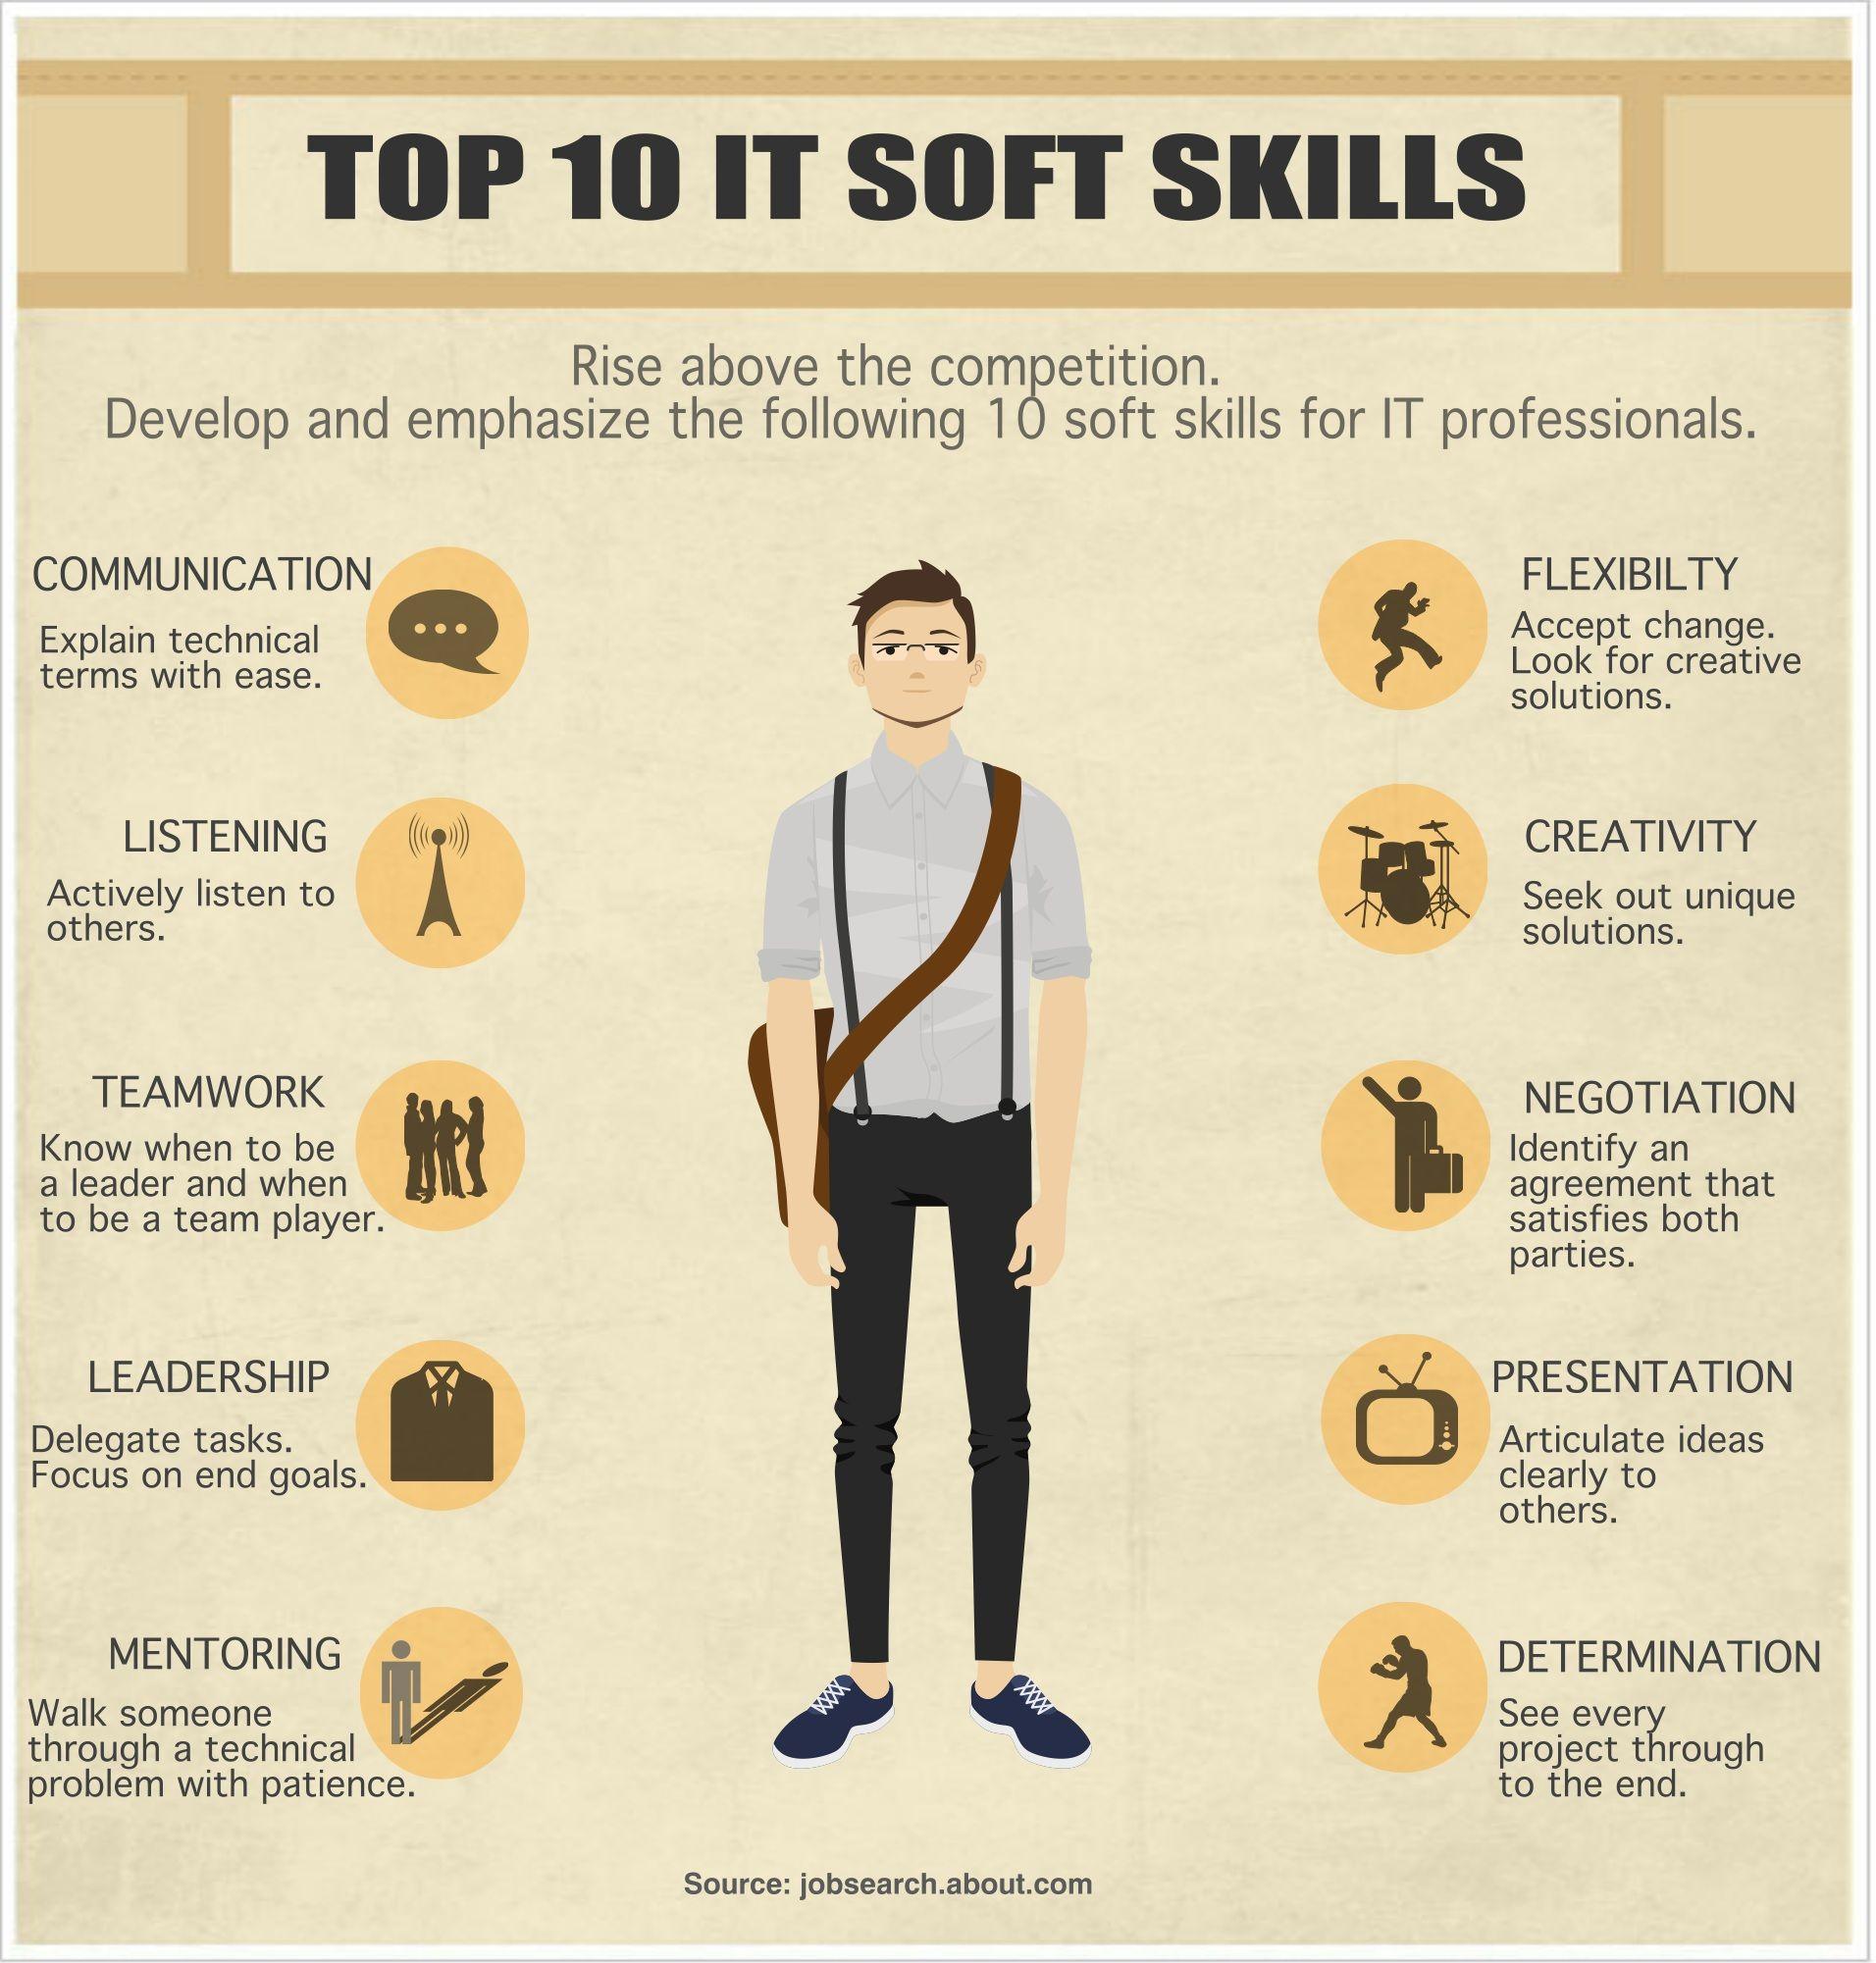 Top 10 IT Soft Skills Career advice